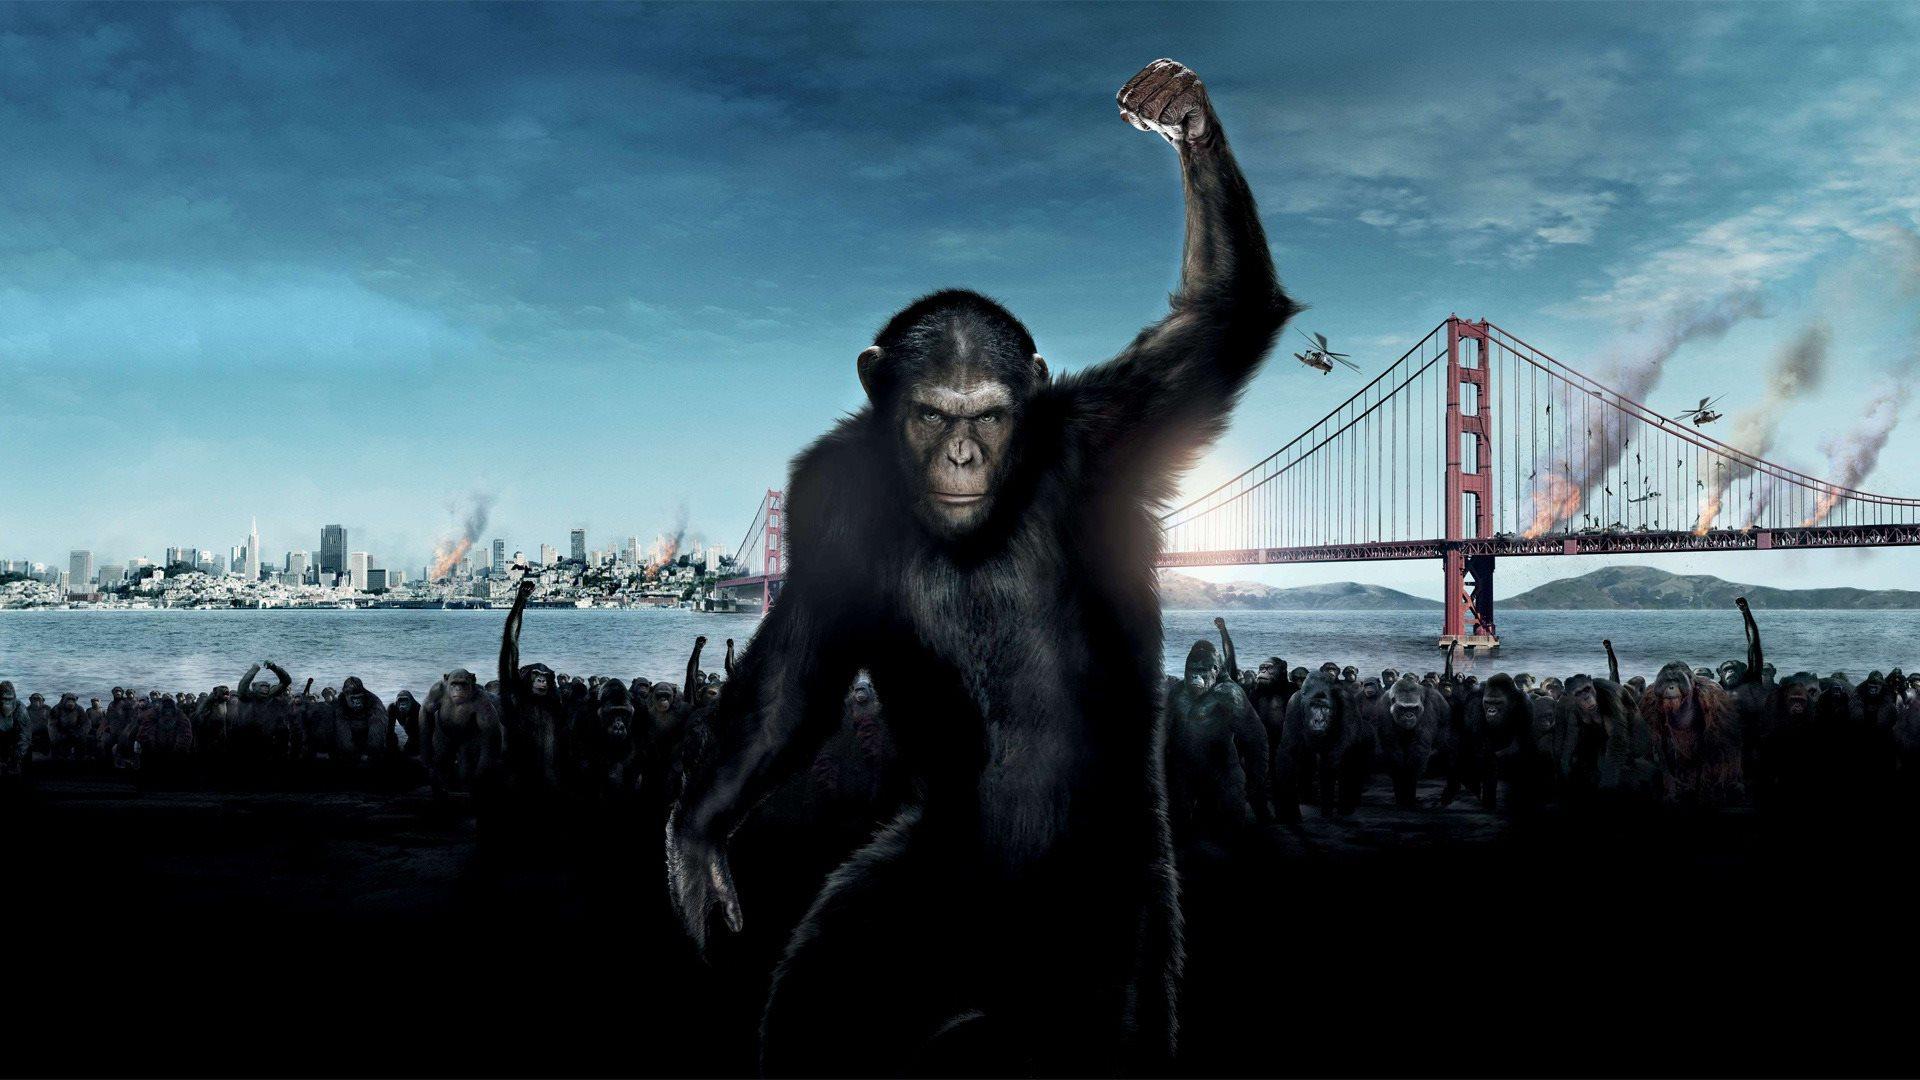 Planeta Dos Macacos o Confronto Wallpaper o Novo Trailer de Planeta Dos